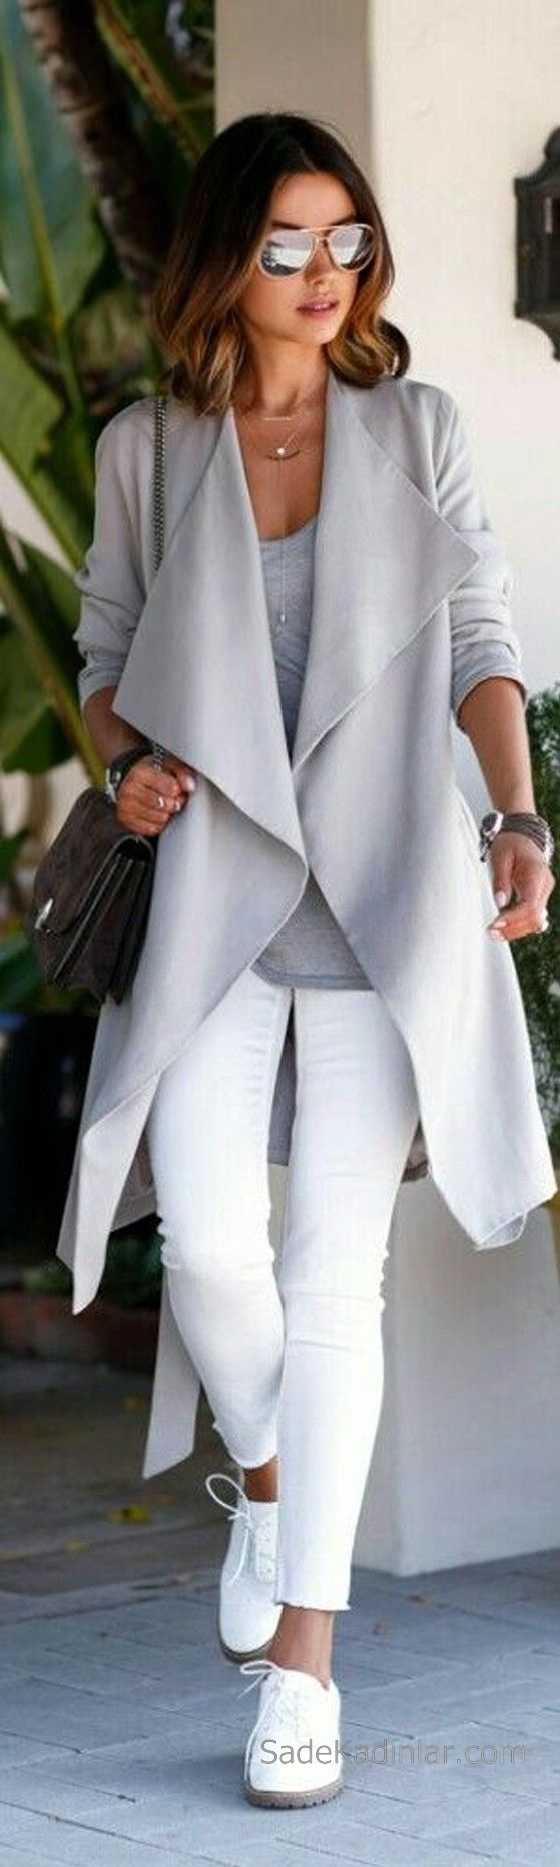 Gri elbise ile kış kombini 2019